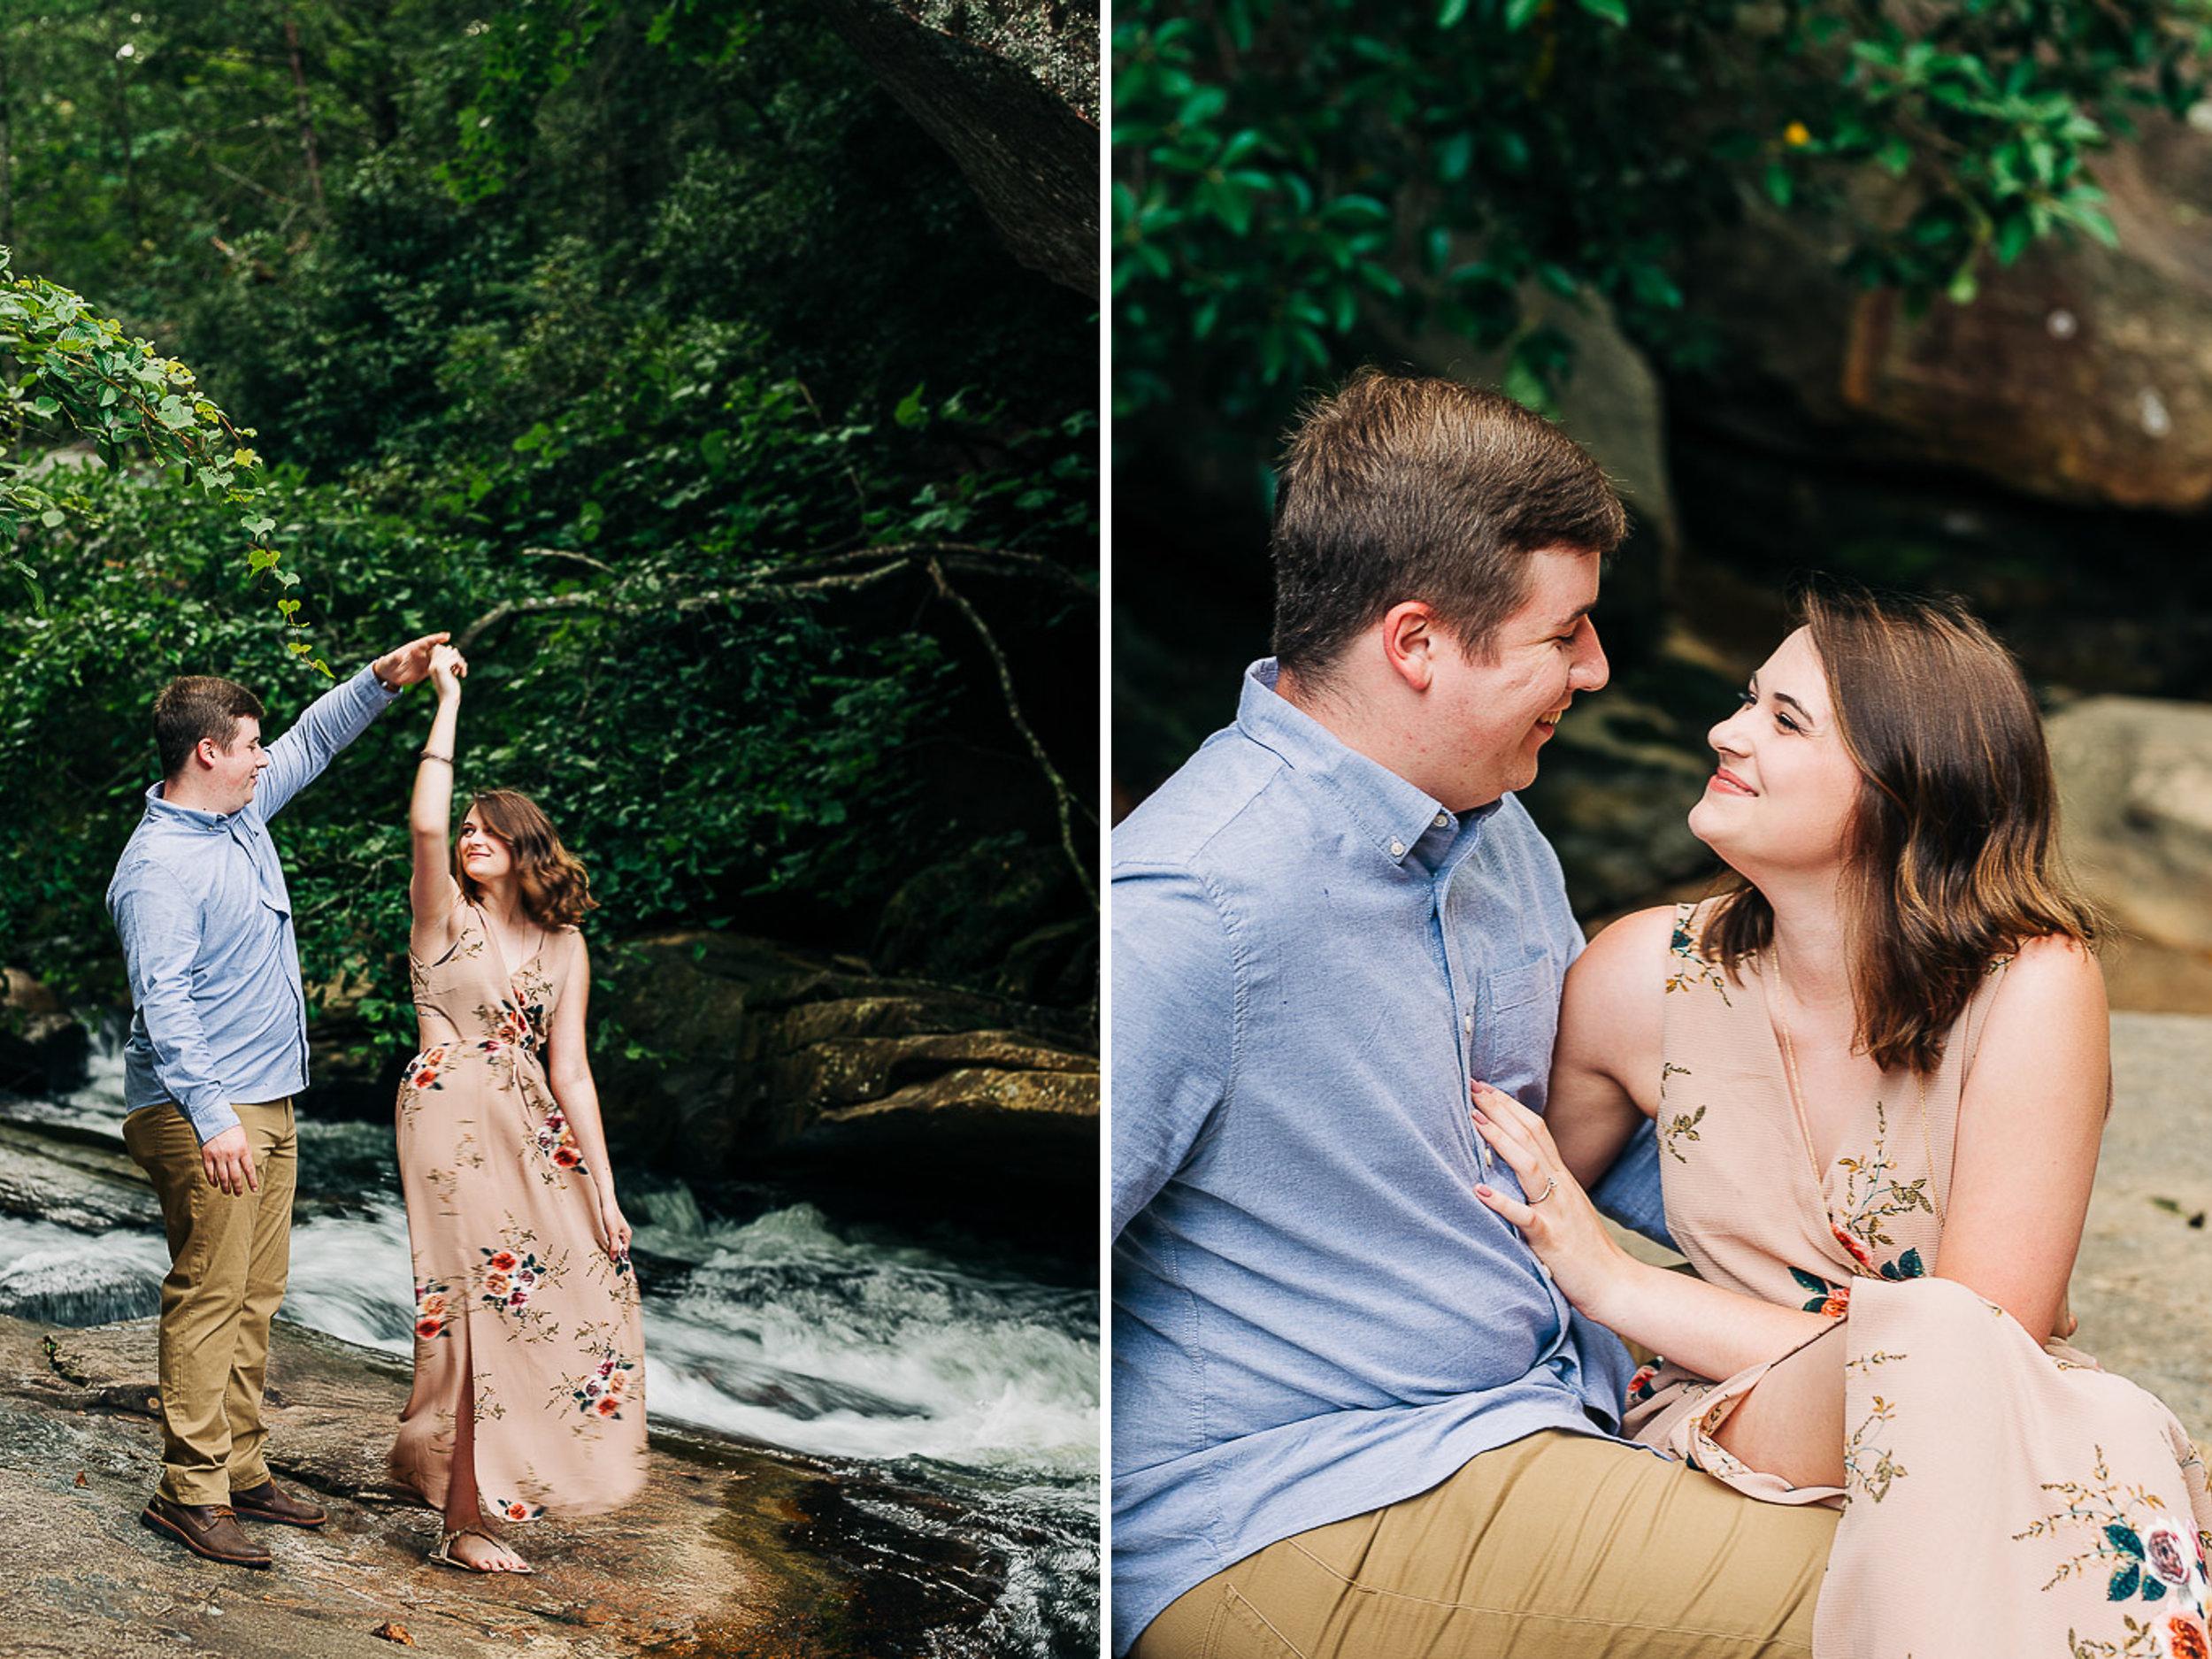 River Engagement Portraits, Summer Engagement Portraits, Engaged, South Carolina 02.jpg